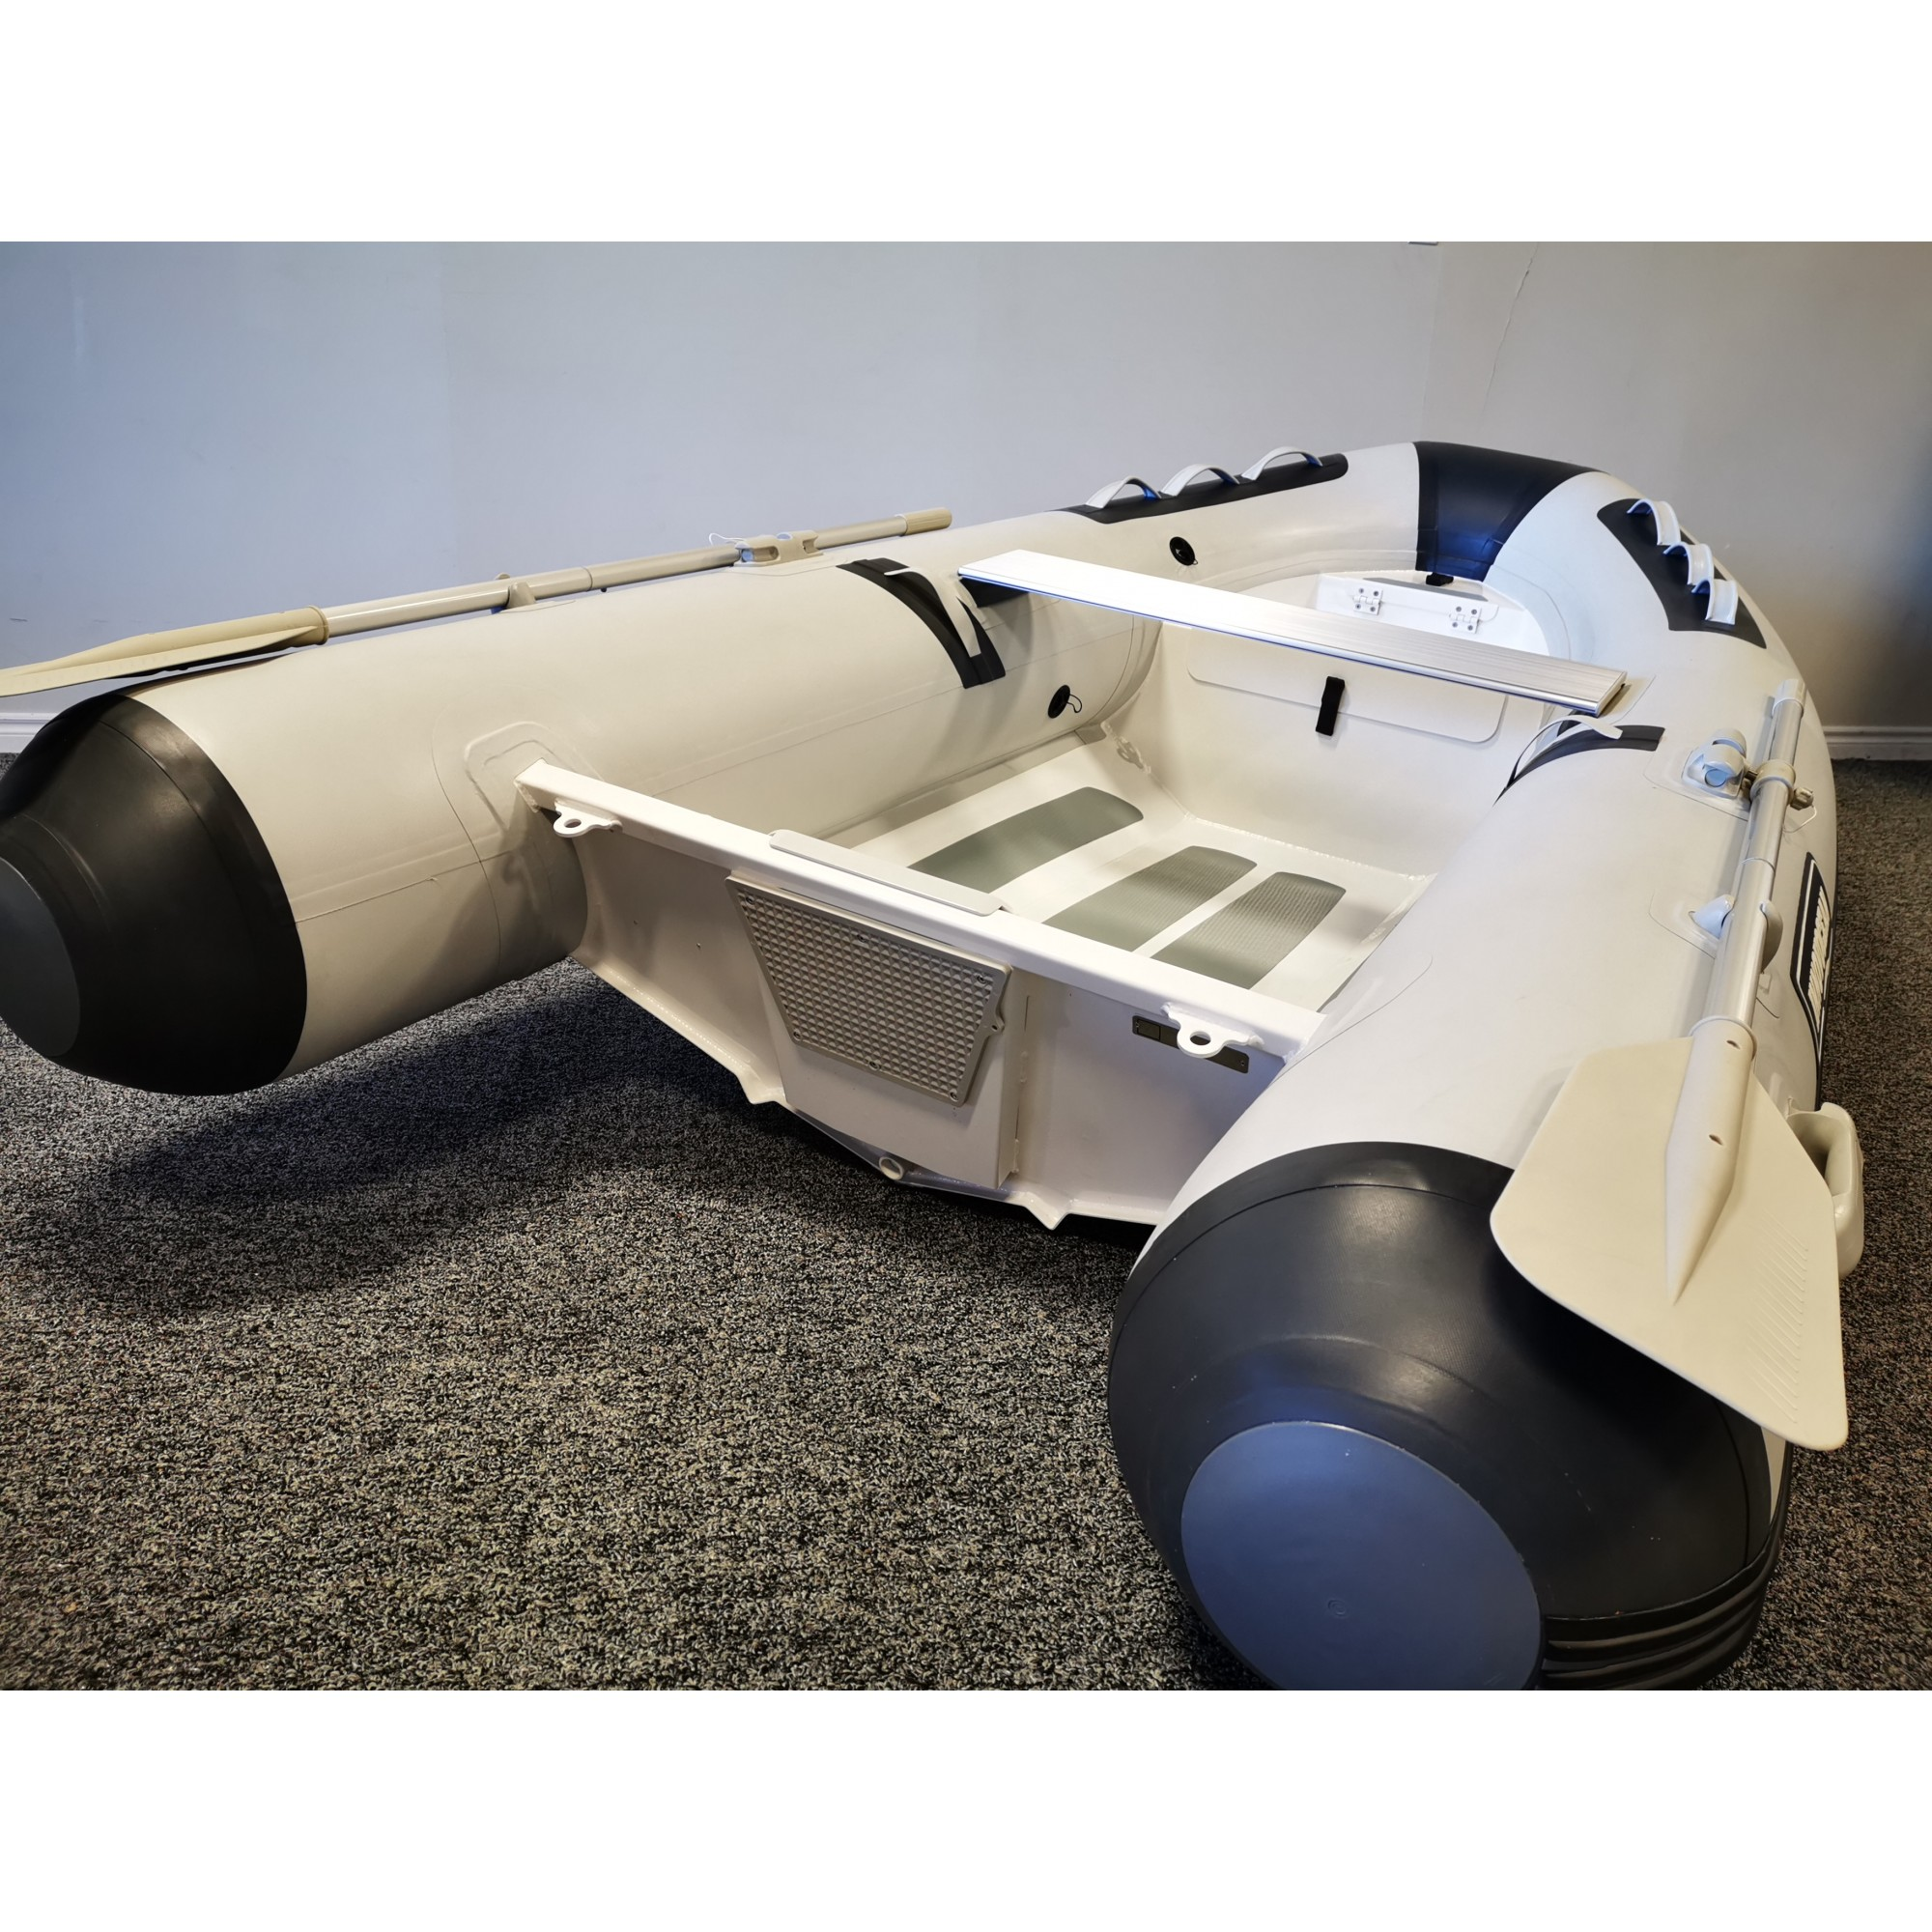 ALD 300 (10 feet) Classic Double Deck Aluminum RIB